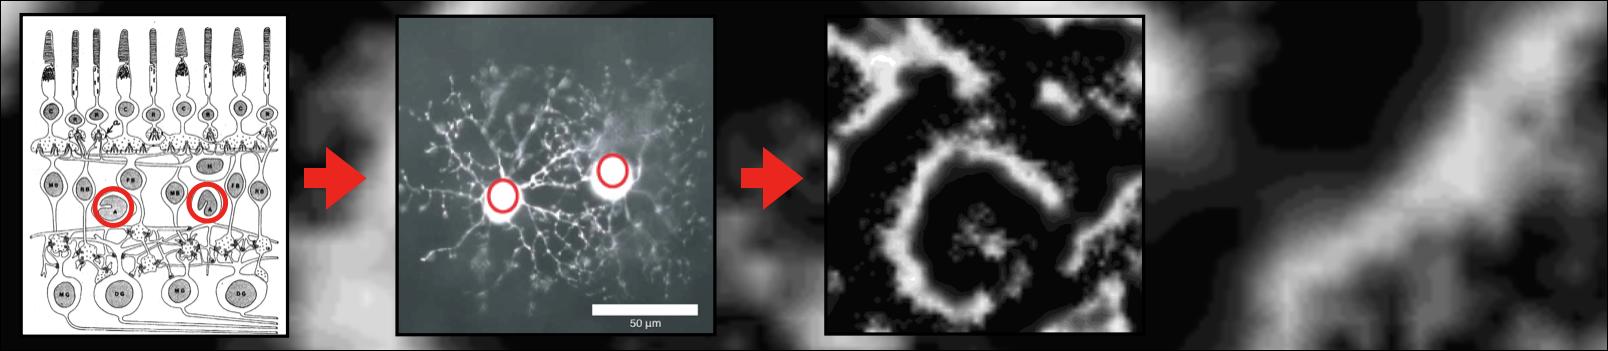 Spontaneous bursting behavior in the developing retina